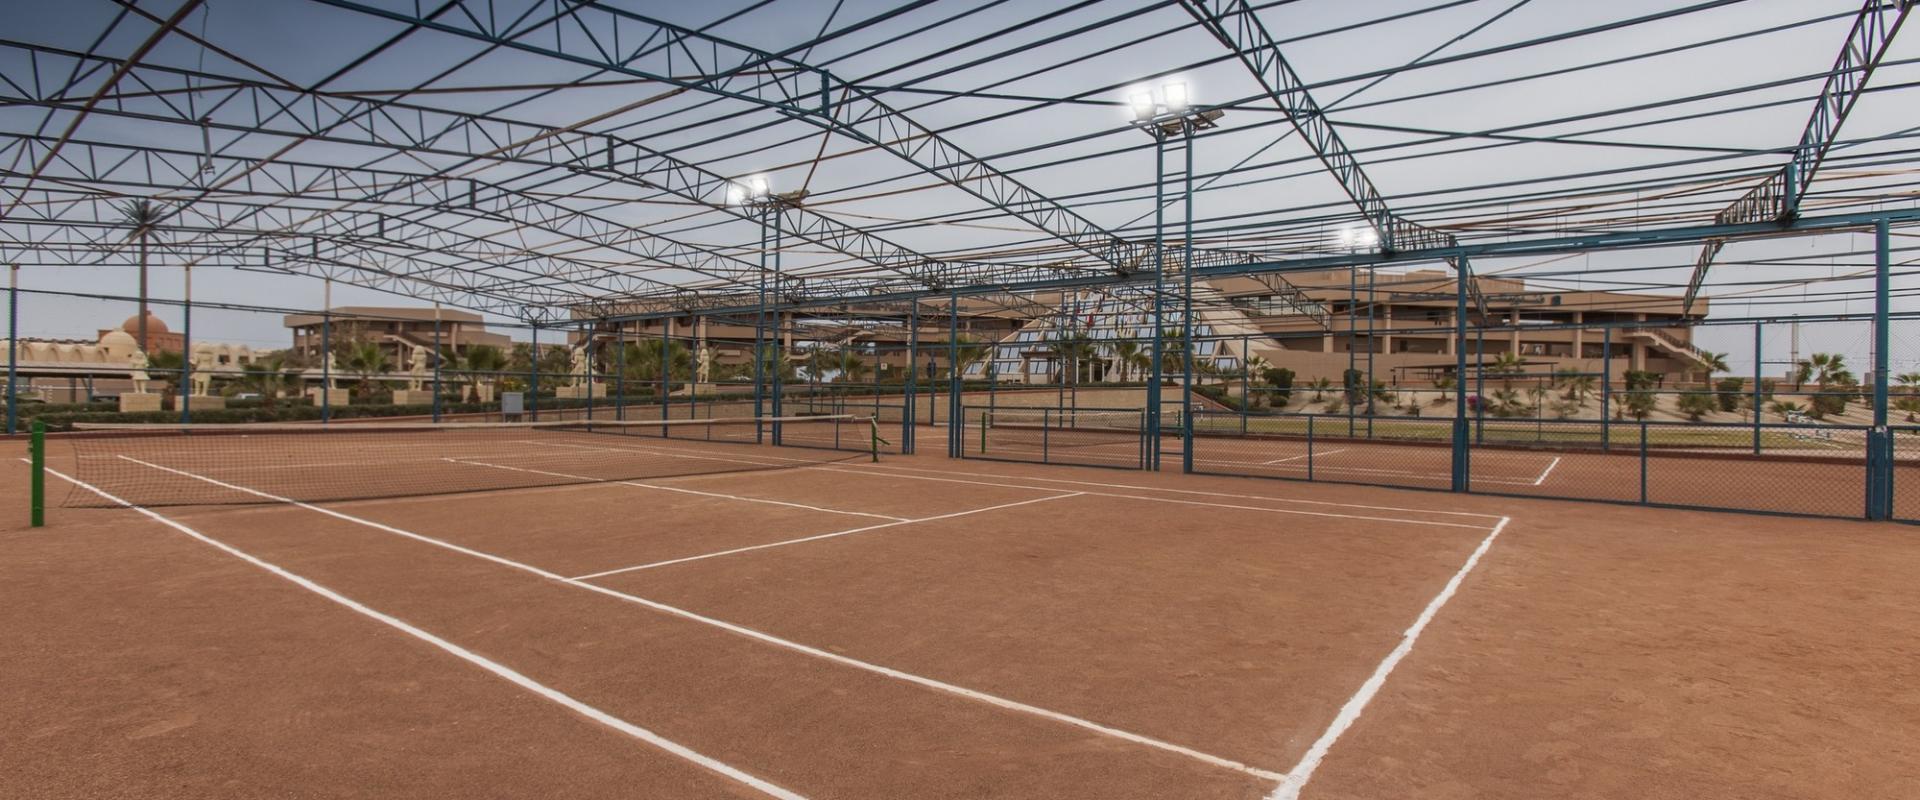 http://egypte.croisiere.voyage/wp-content/uploads/2016/11/HRG-SH-Hurghada-Tennis-Court.jpg